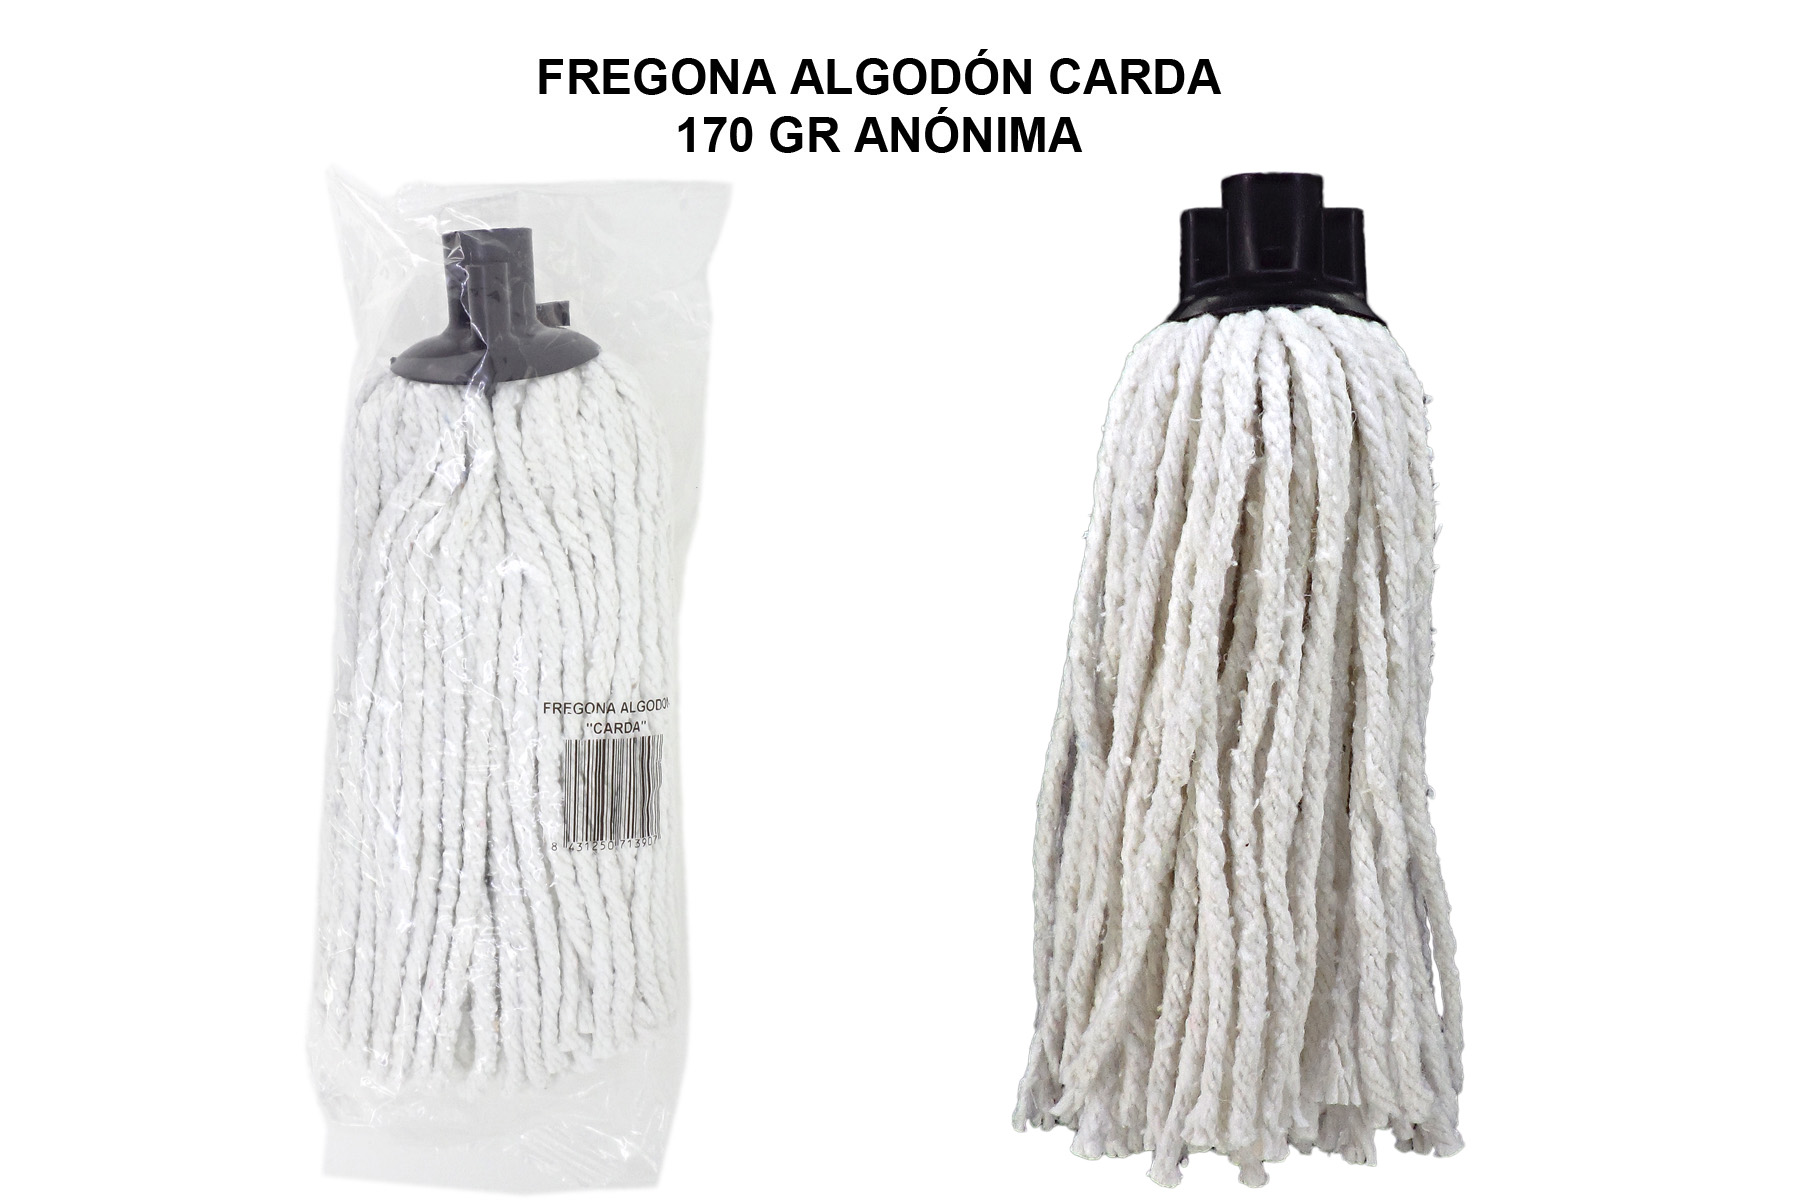 FREGONA ALGODON CARDA 170 GR ANONIMA